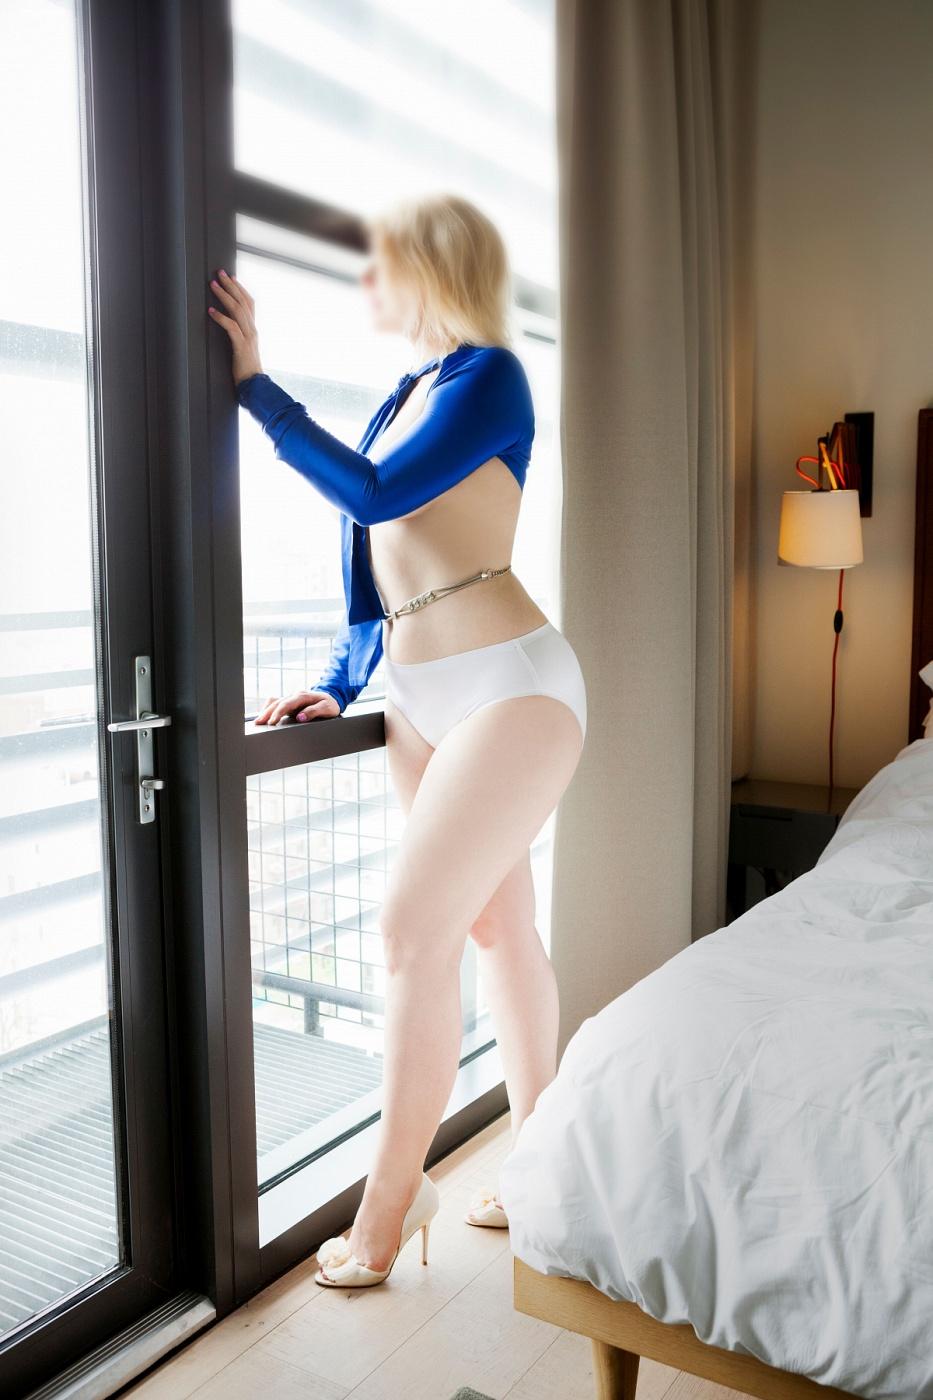 Christina O